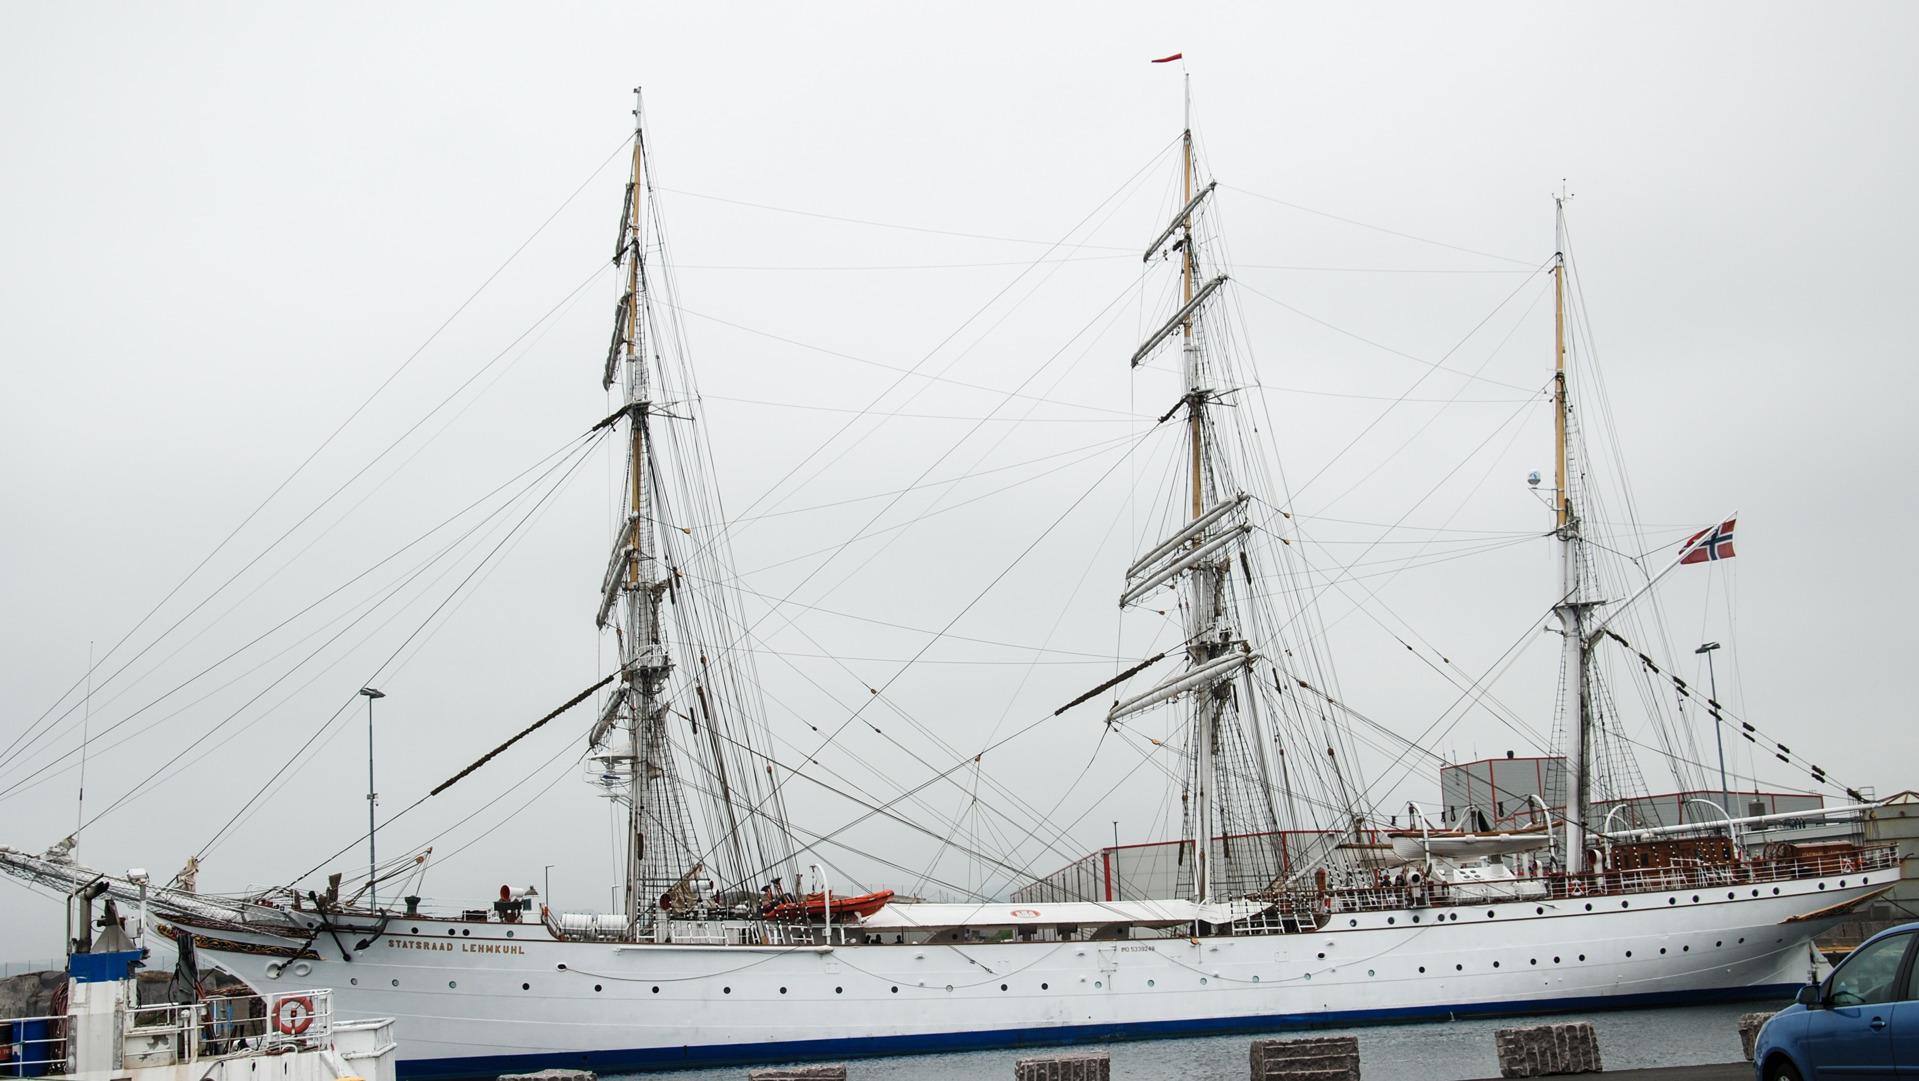 Tall Ships Races 2018 Hå historielag (8).jpg